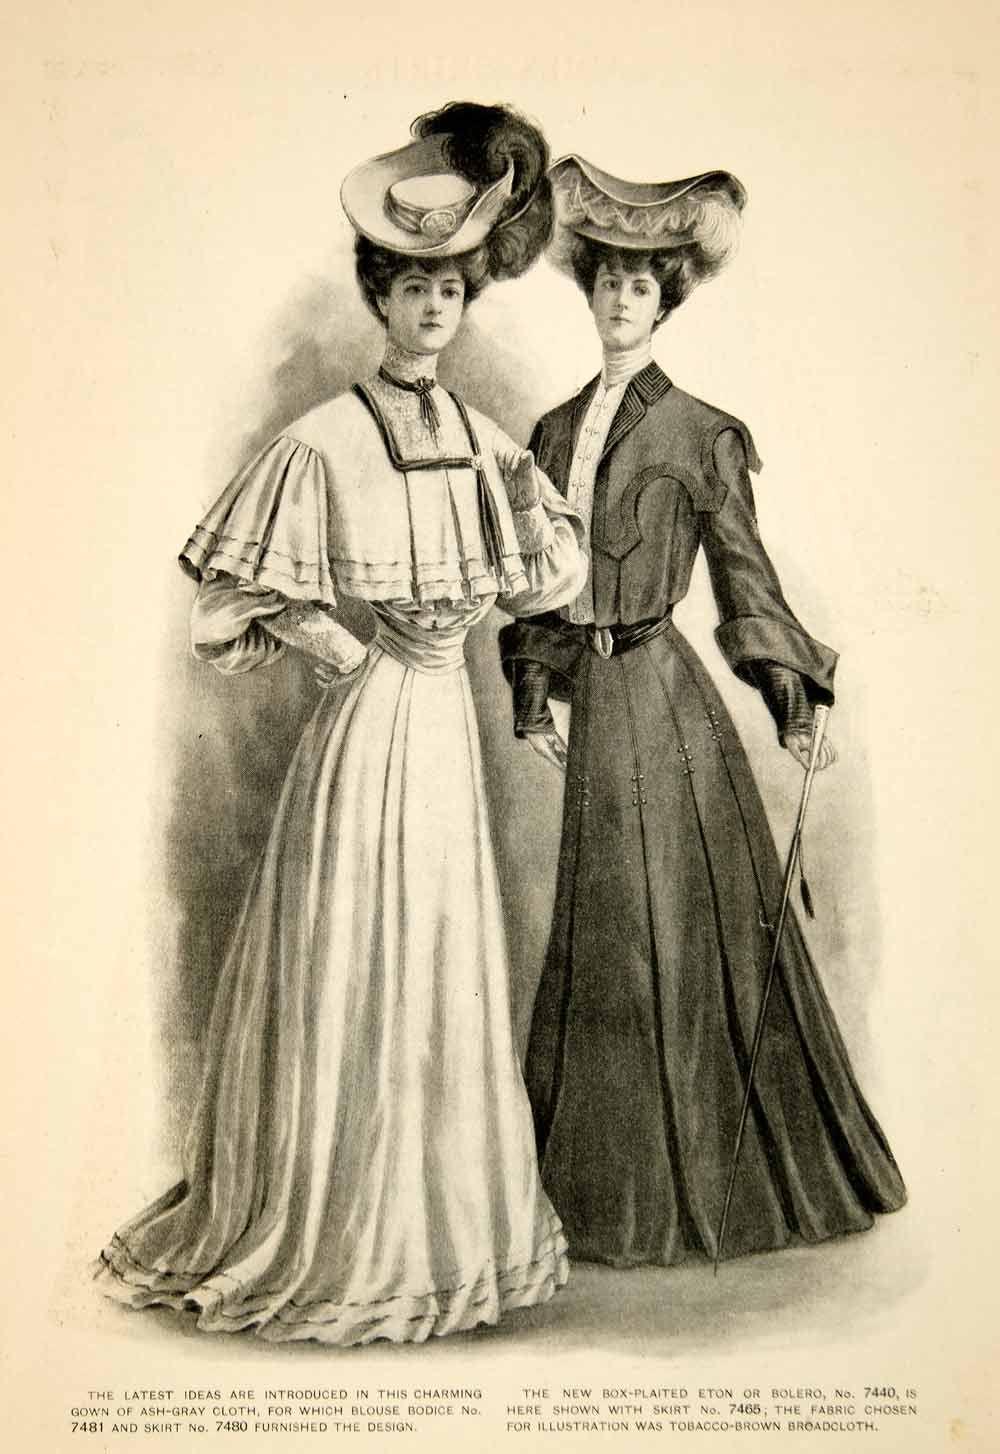 d0377a6d257 Details about 1904 Print Fashion Costume Clothing Edwardian Women ...